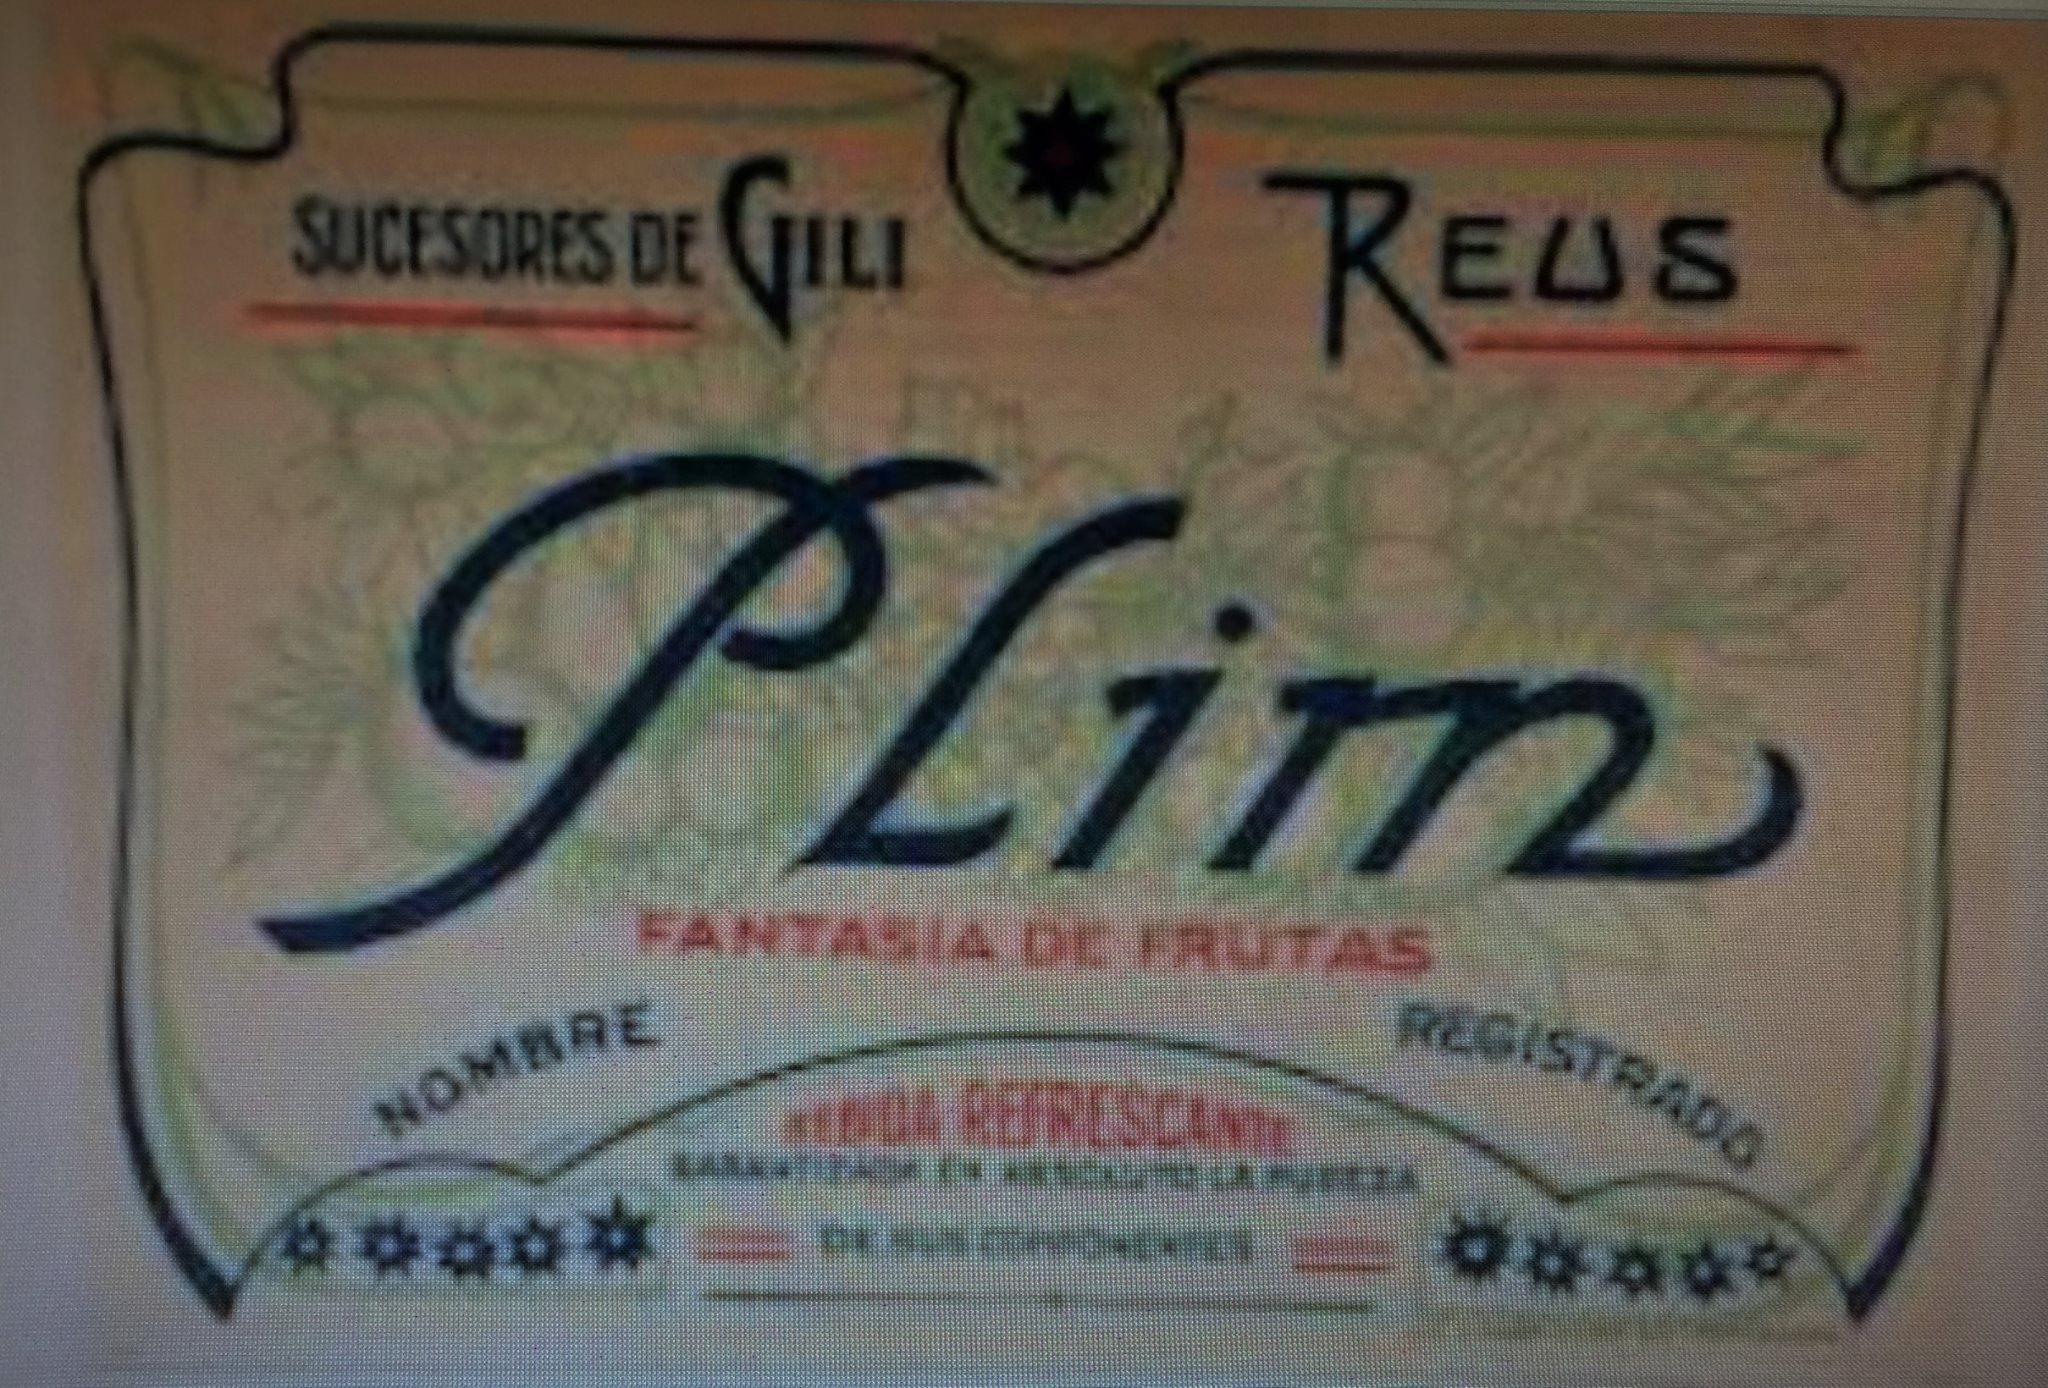 Depiction of Plim